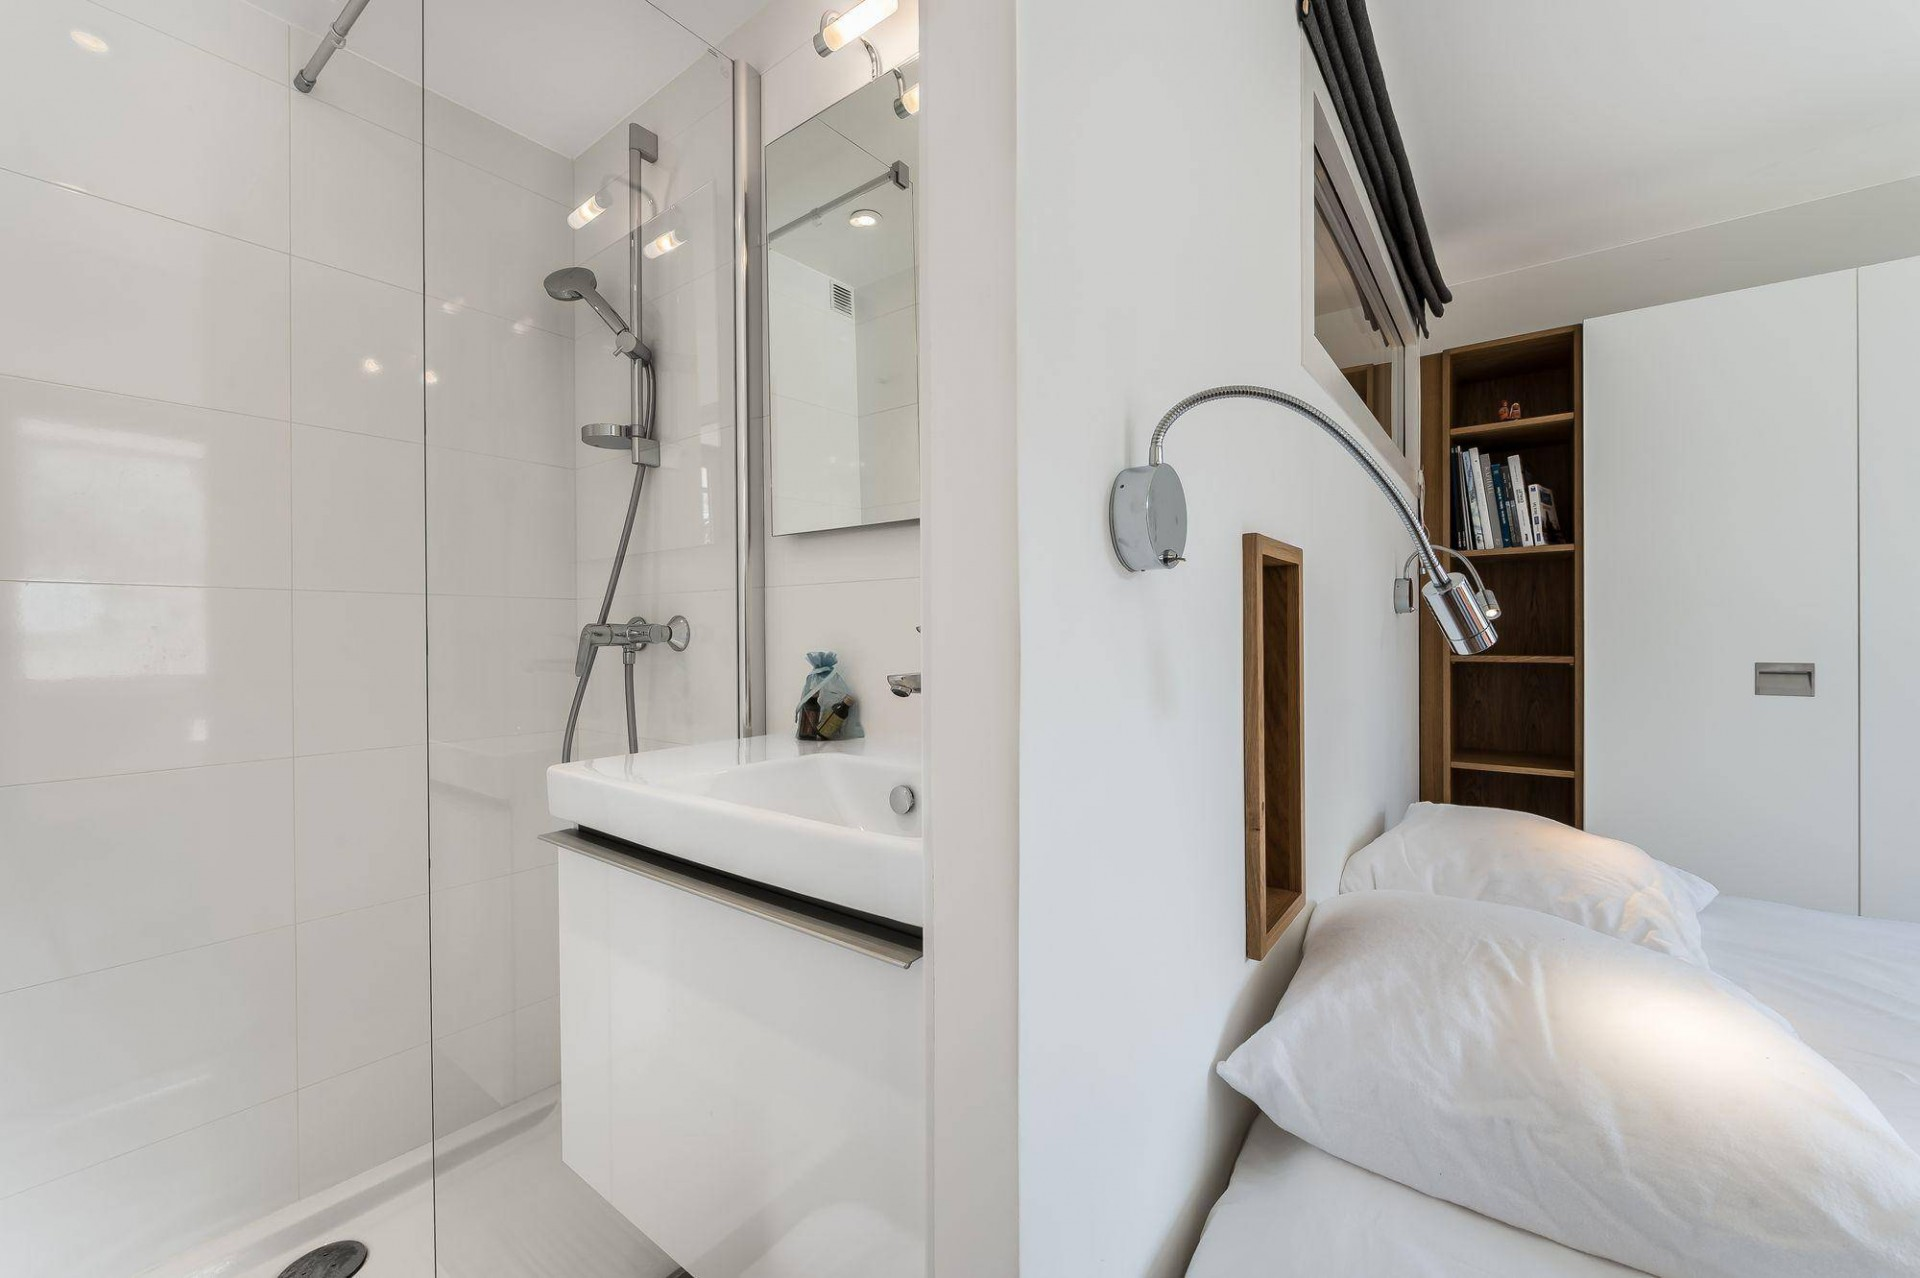 Val d'Isère Luxury Rental Appartment Eclaite Bathroom